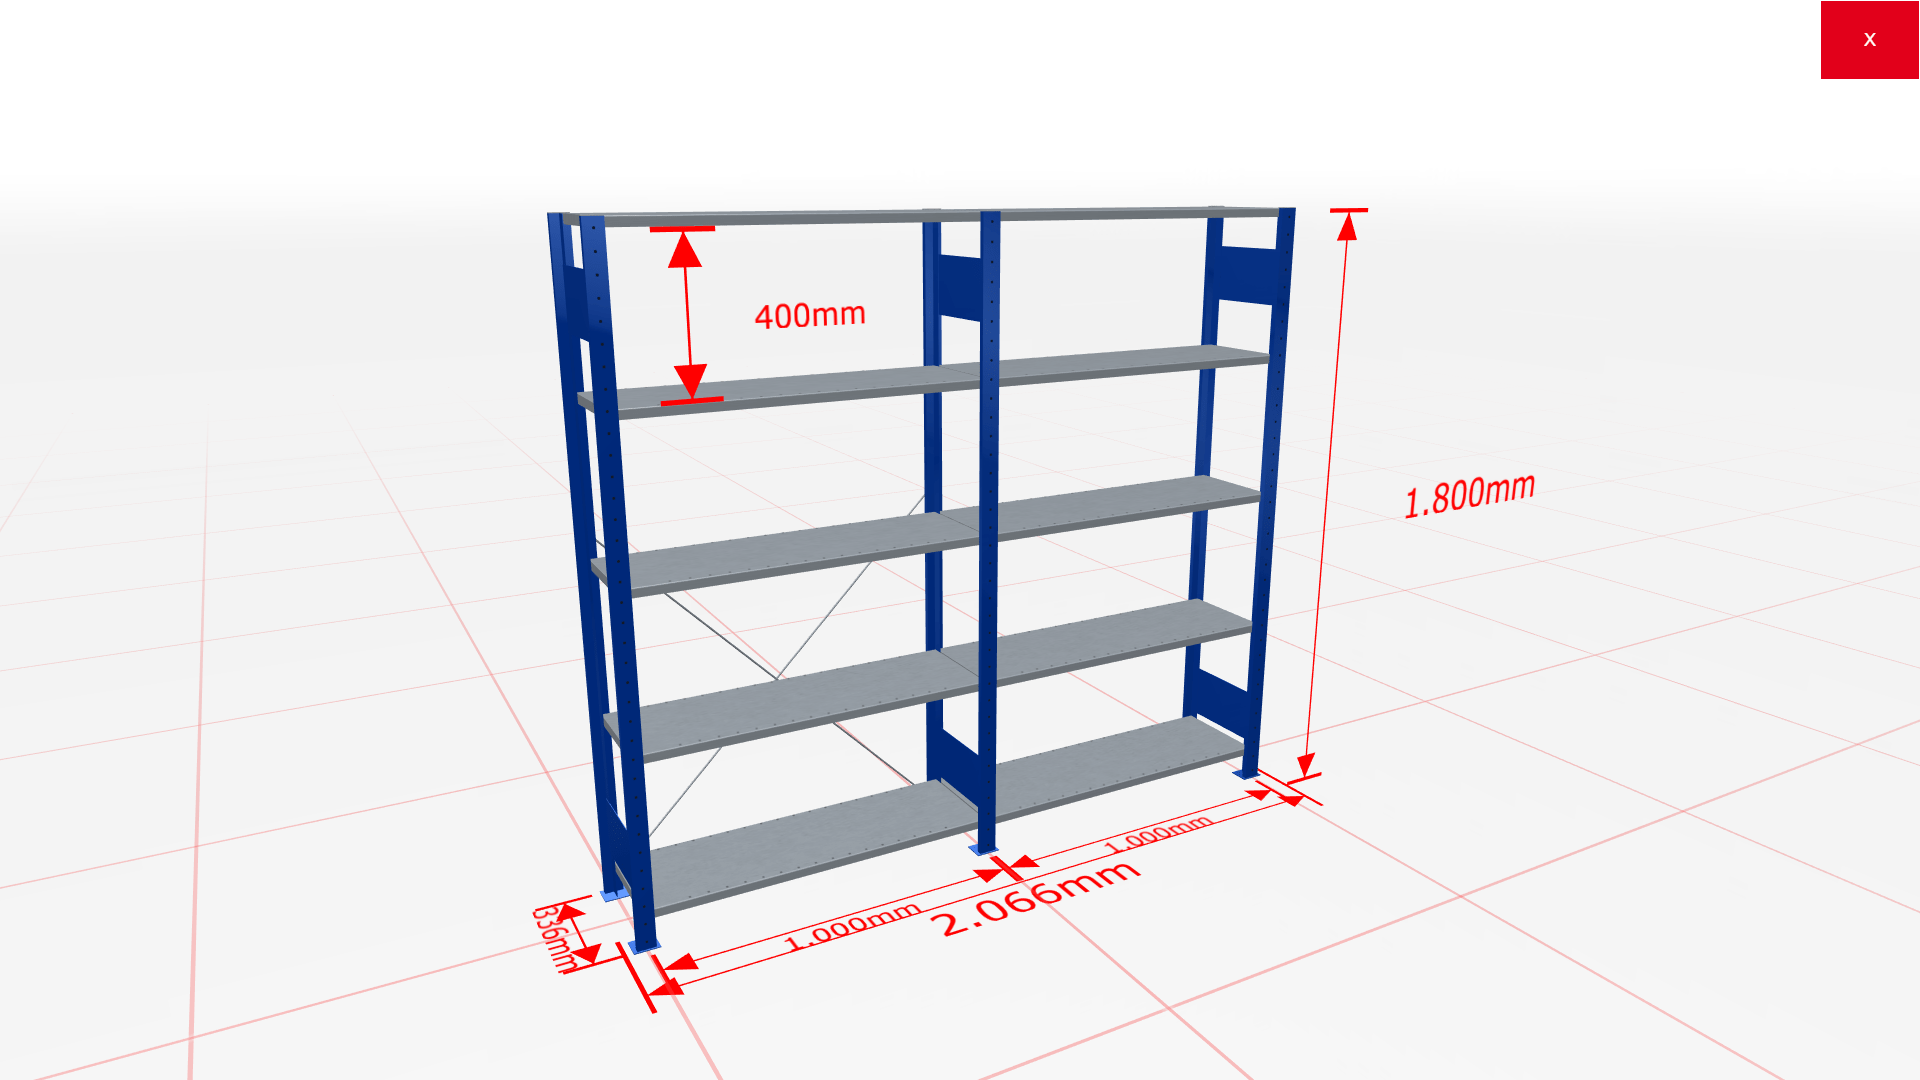 Fachbodenregal Komplettregal 1800x2066x300 mm (HxBxT) SCHULTE Lagertechnik blau 5 Ebenen  150 kg je Boden